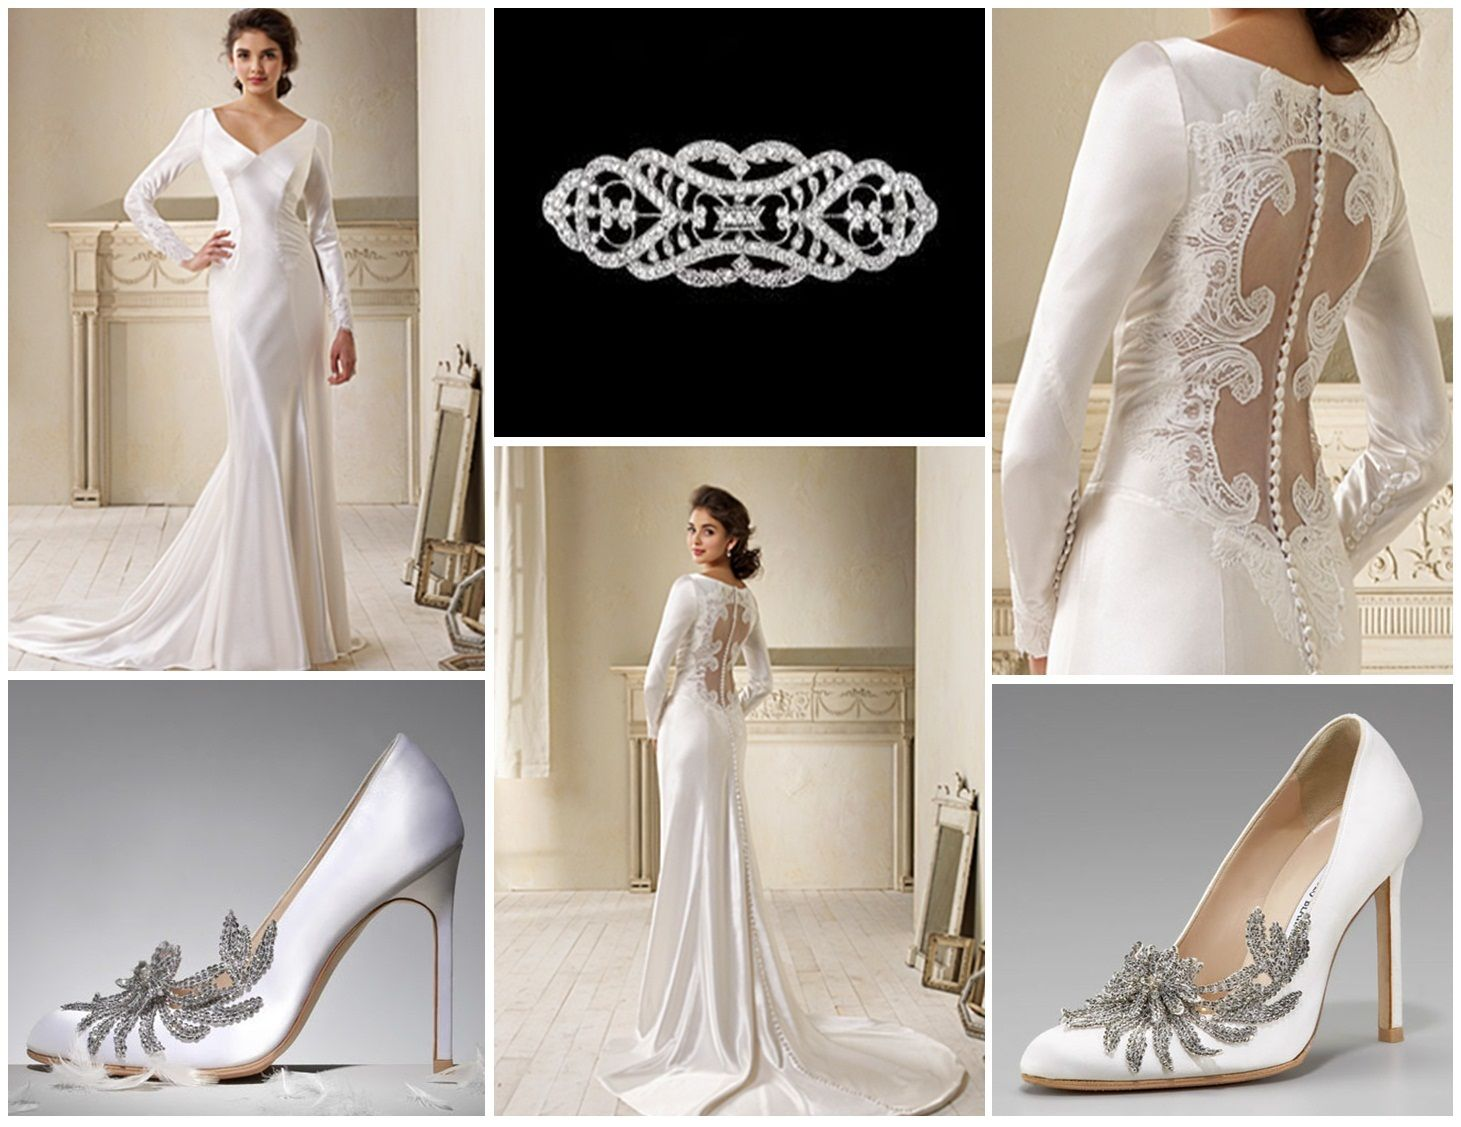 Bella's wedding dress in breaking dawn  mms u nfs Bella Swan wedding dress inspired  Twilight  Pinterest